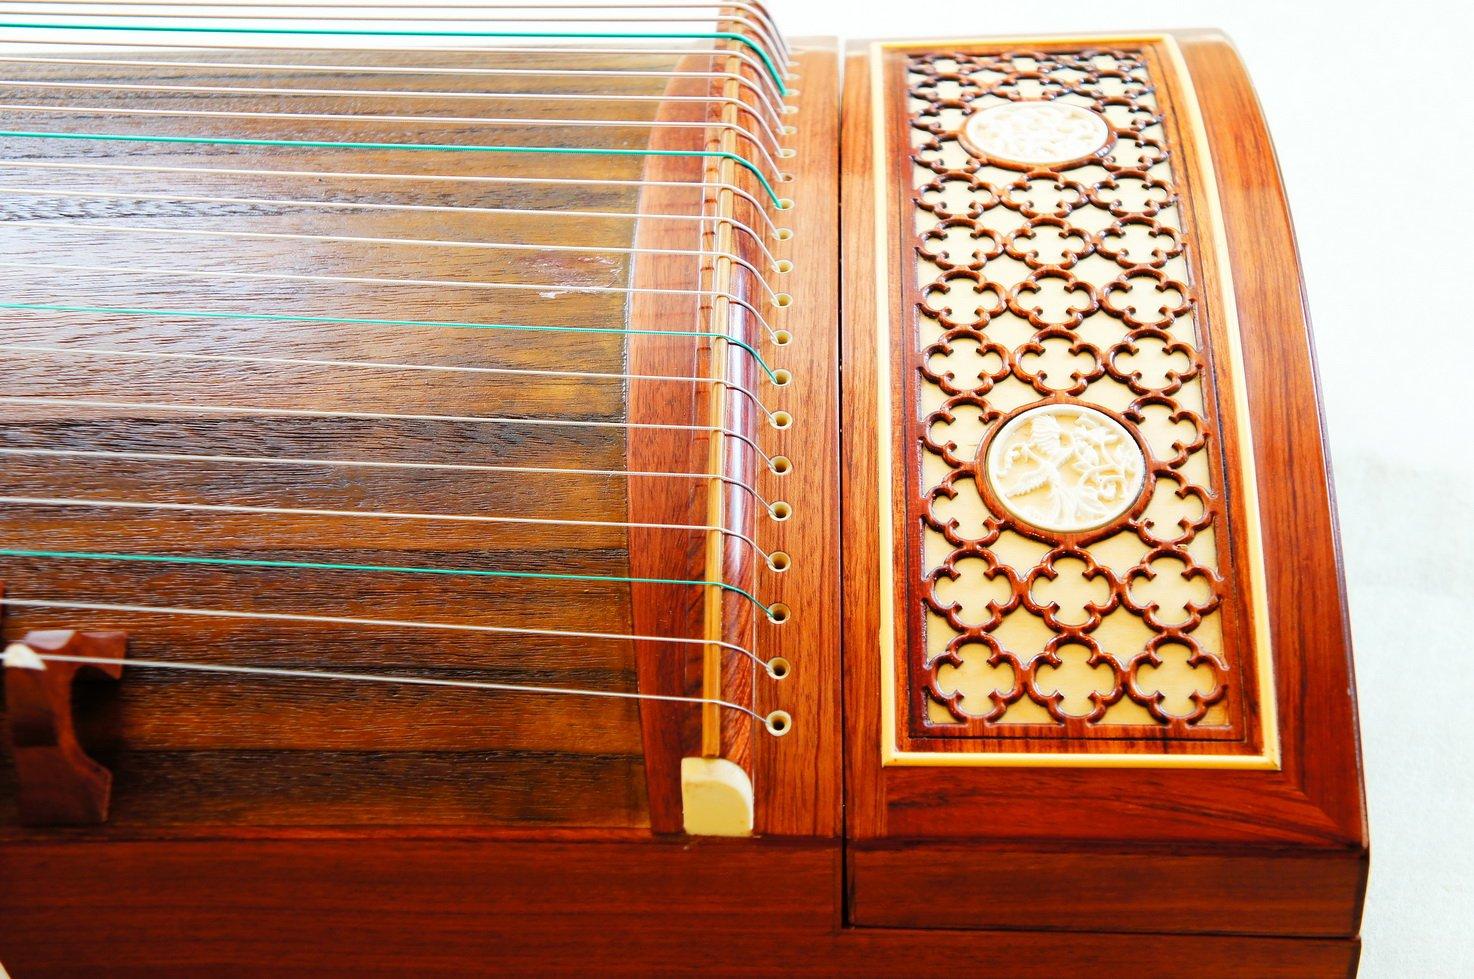 Model GZ301 Professional level Guzheng musical instrument